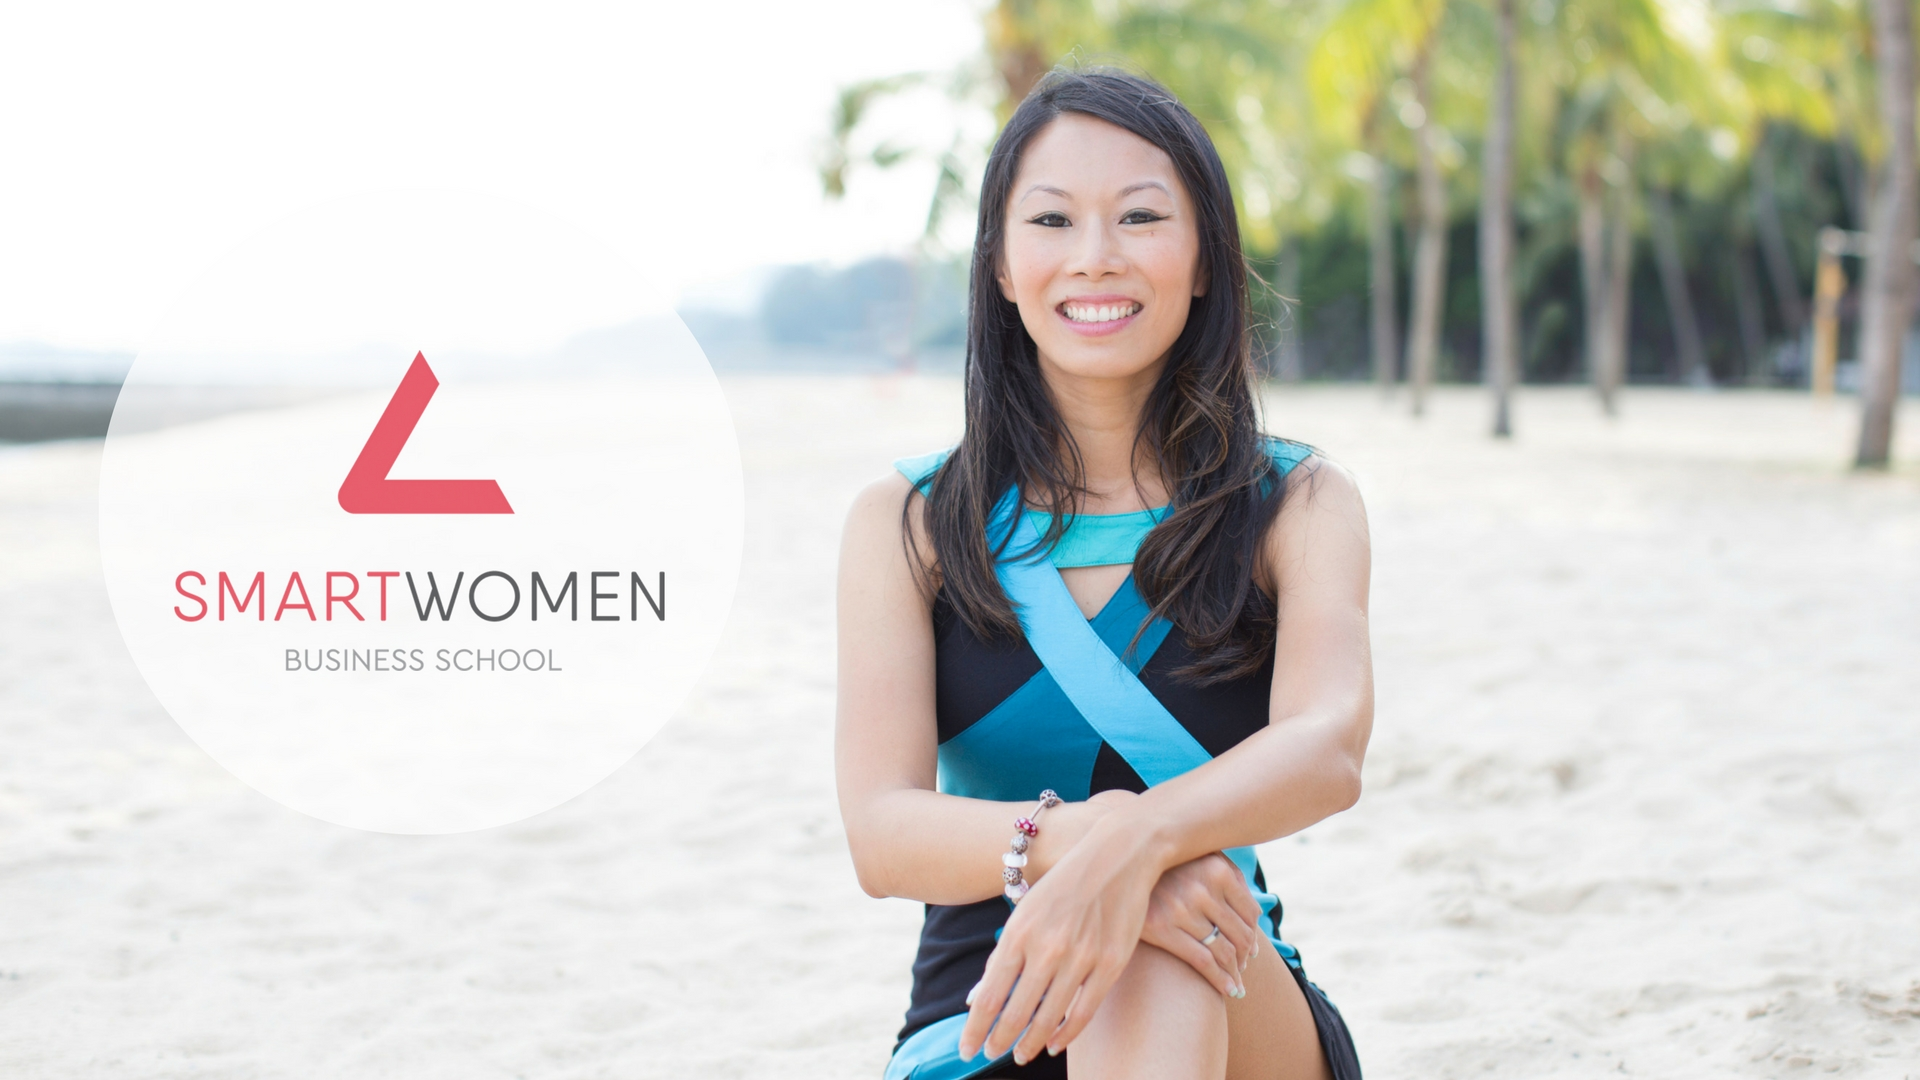 Smartwomen Business School per coach